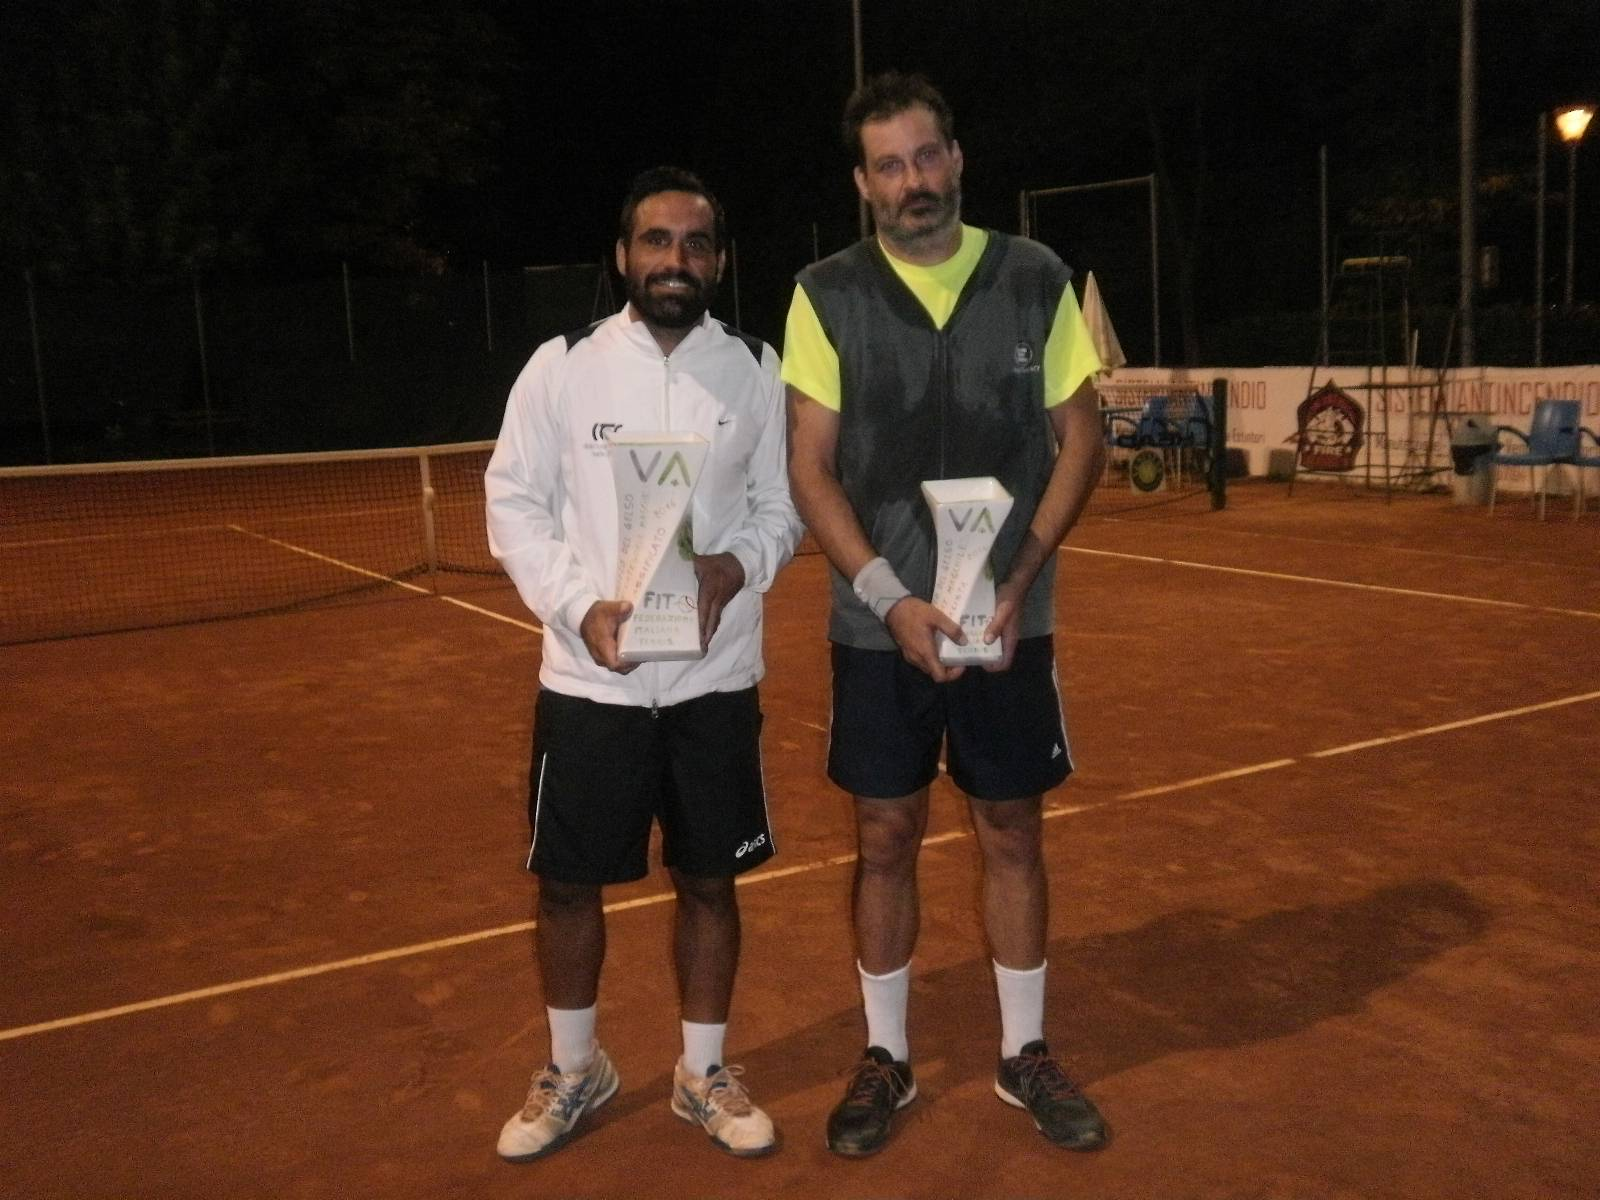 Diego Pellegrini e Massimiliano Angeli